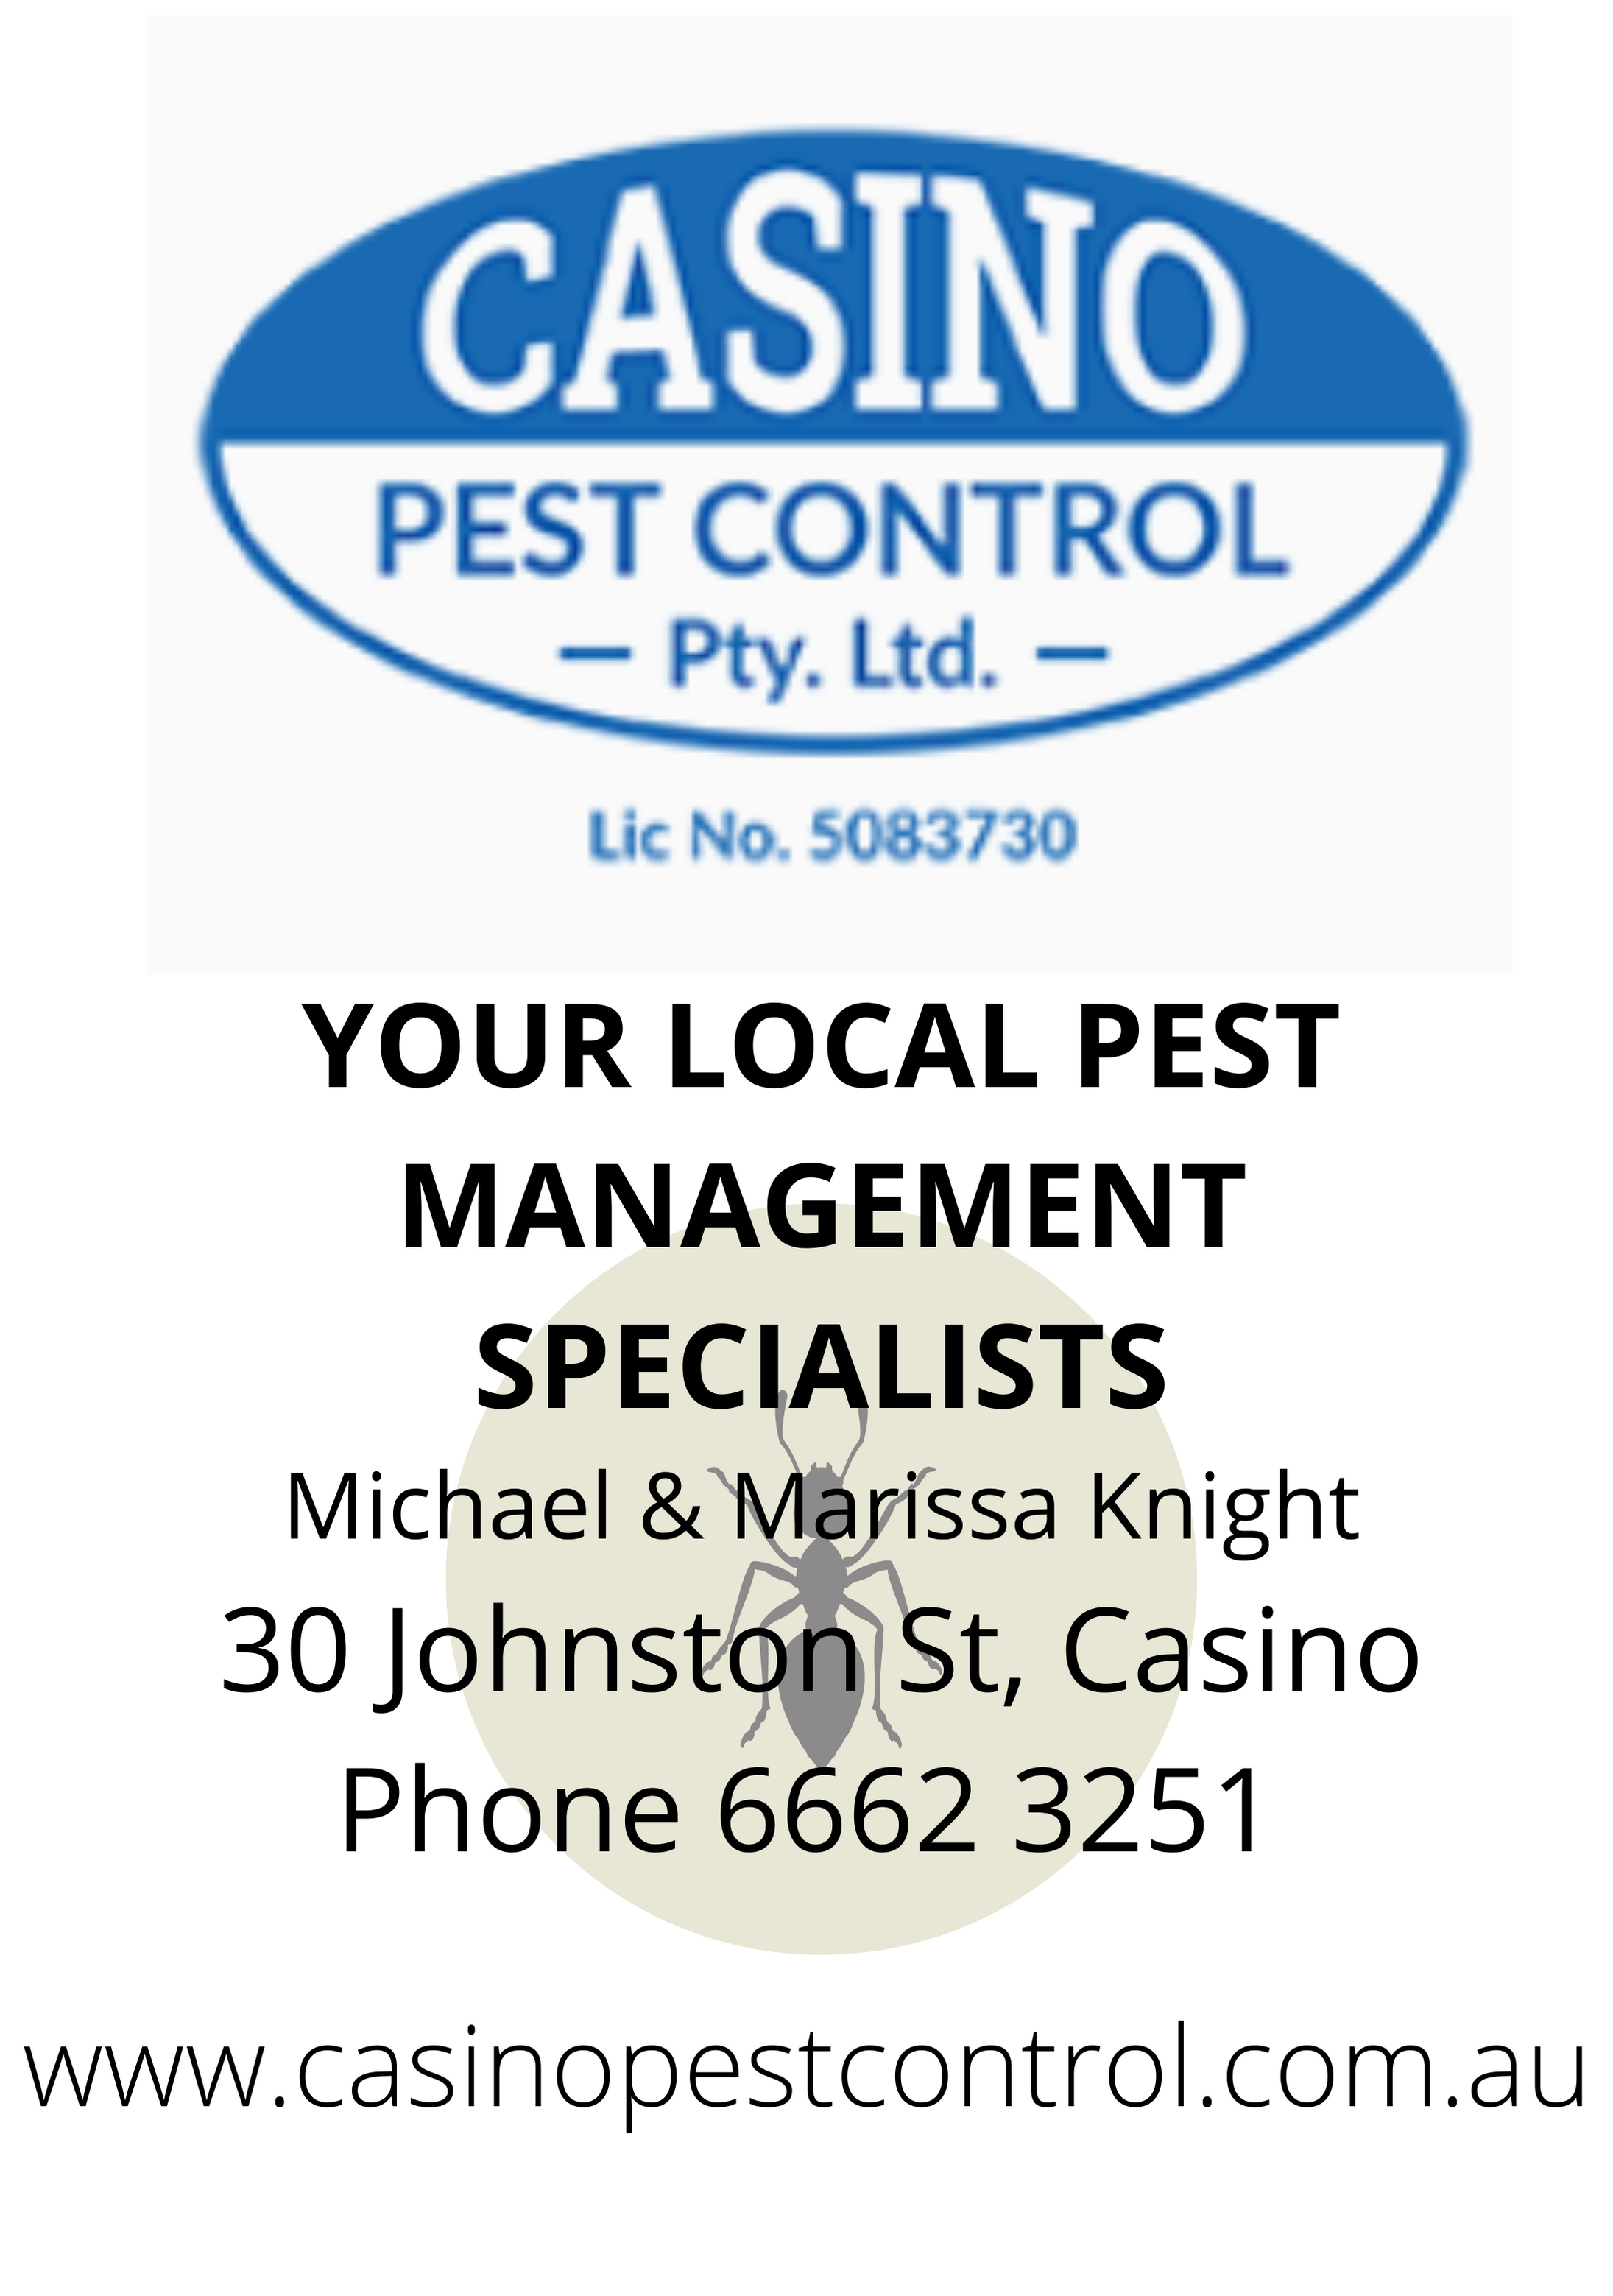 Casino Pest Control